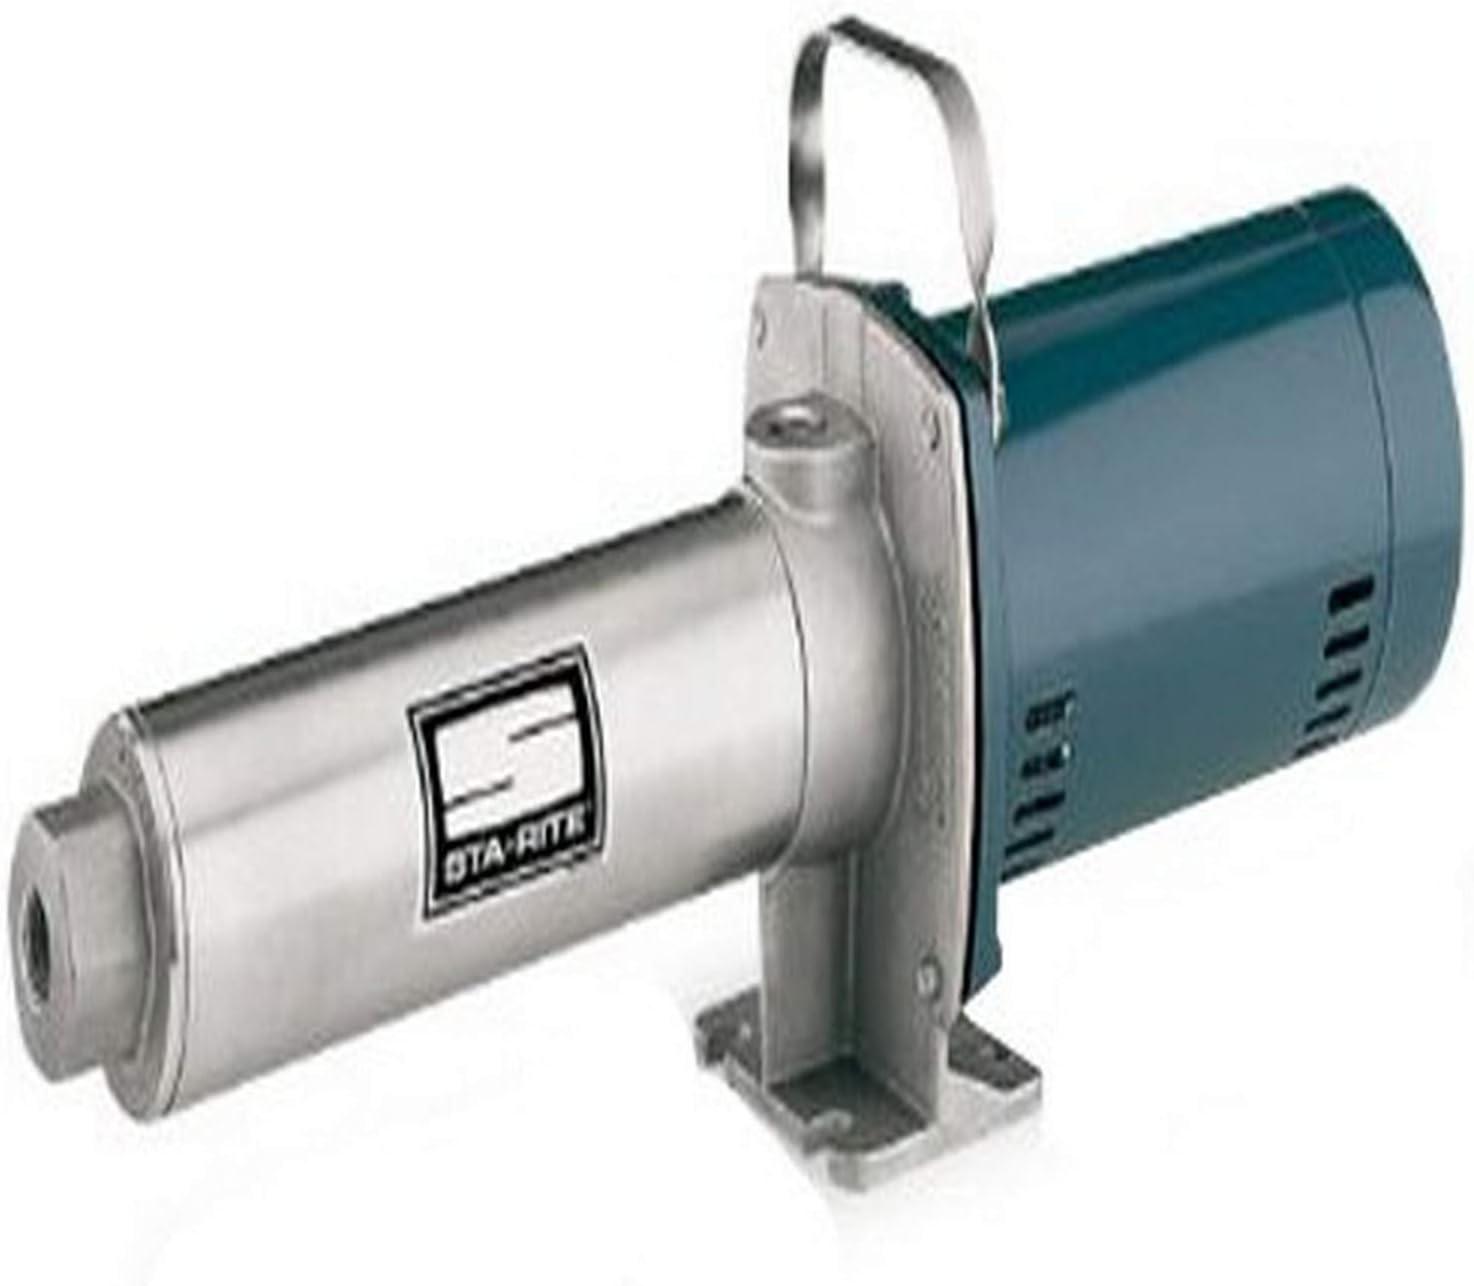 Pentair HP10D-02 Booster Pump, 3/4 HP, 10-GPM